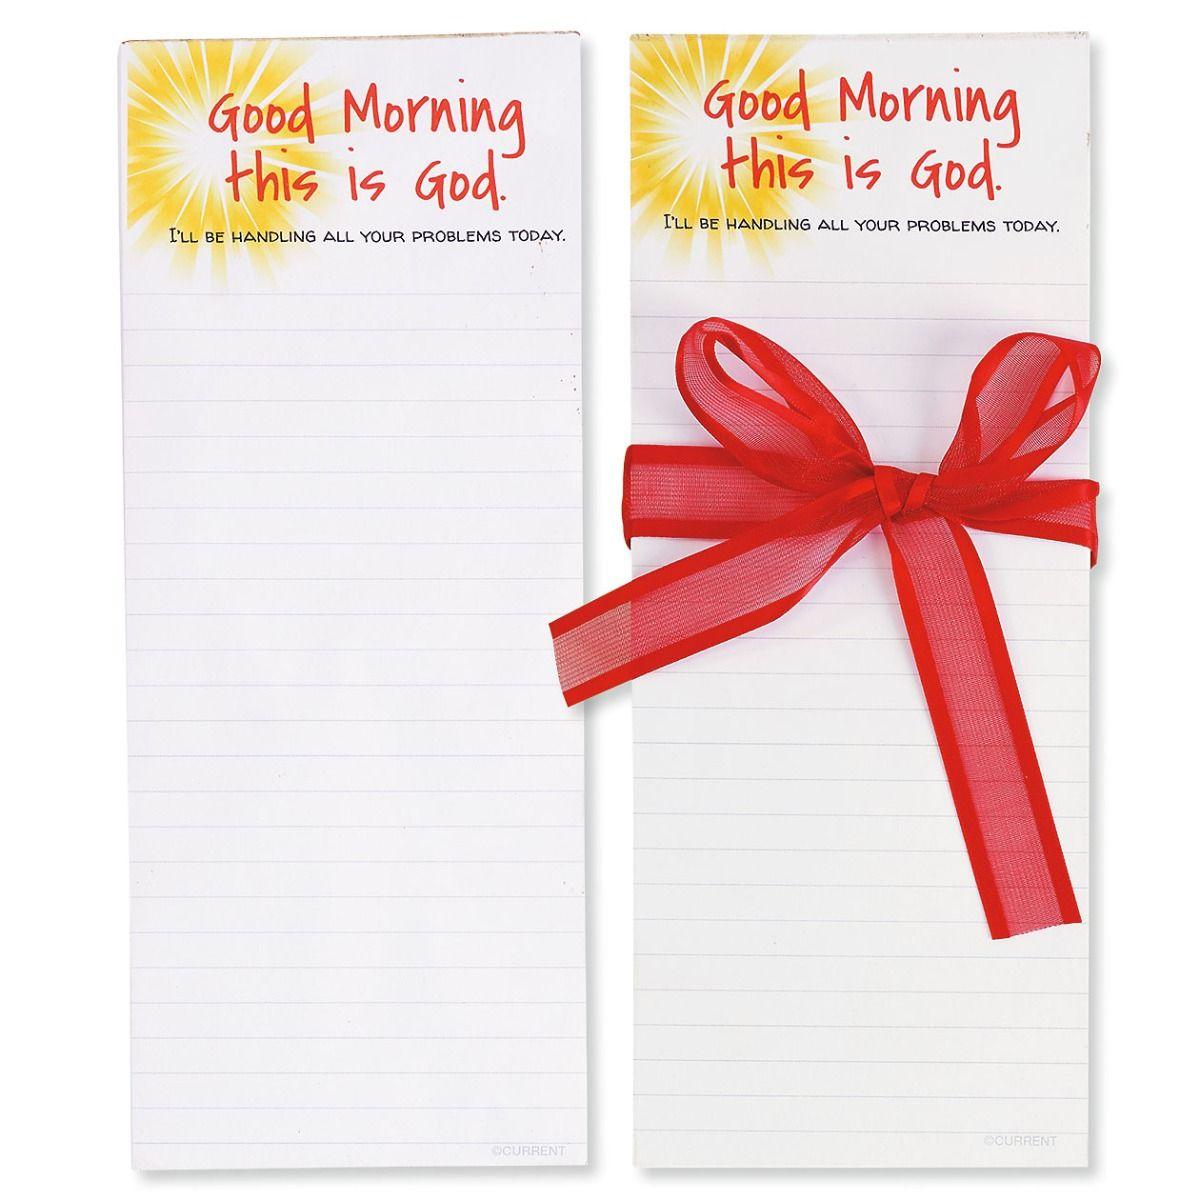 Good Morning Notepads with Ribbon - BOGO